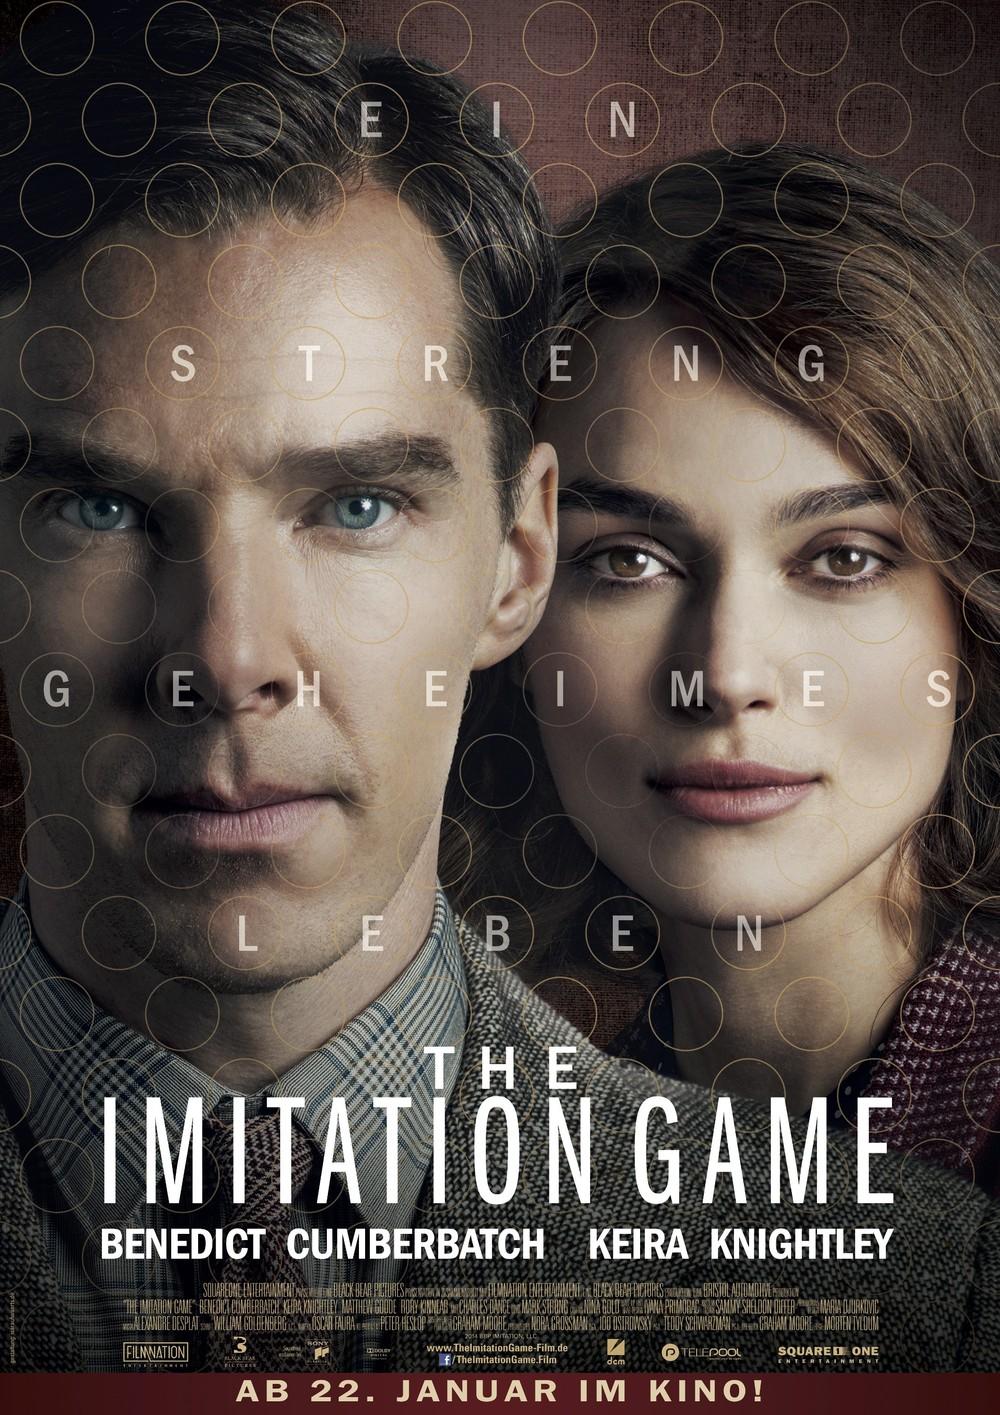 the imitation game full movie